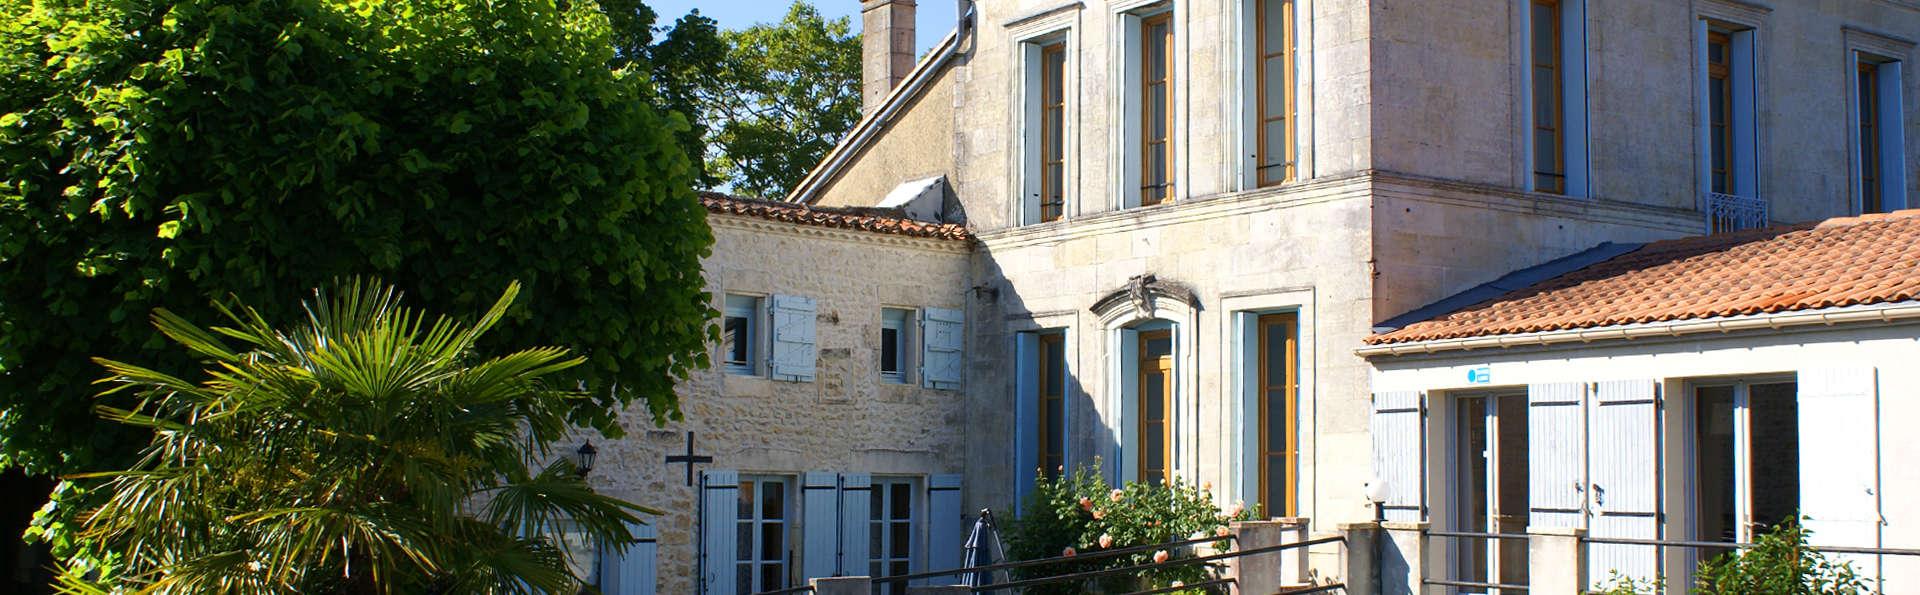 Domaine La Fontaine - EDIT_Exterior1.jpg